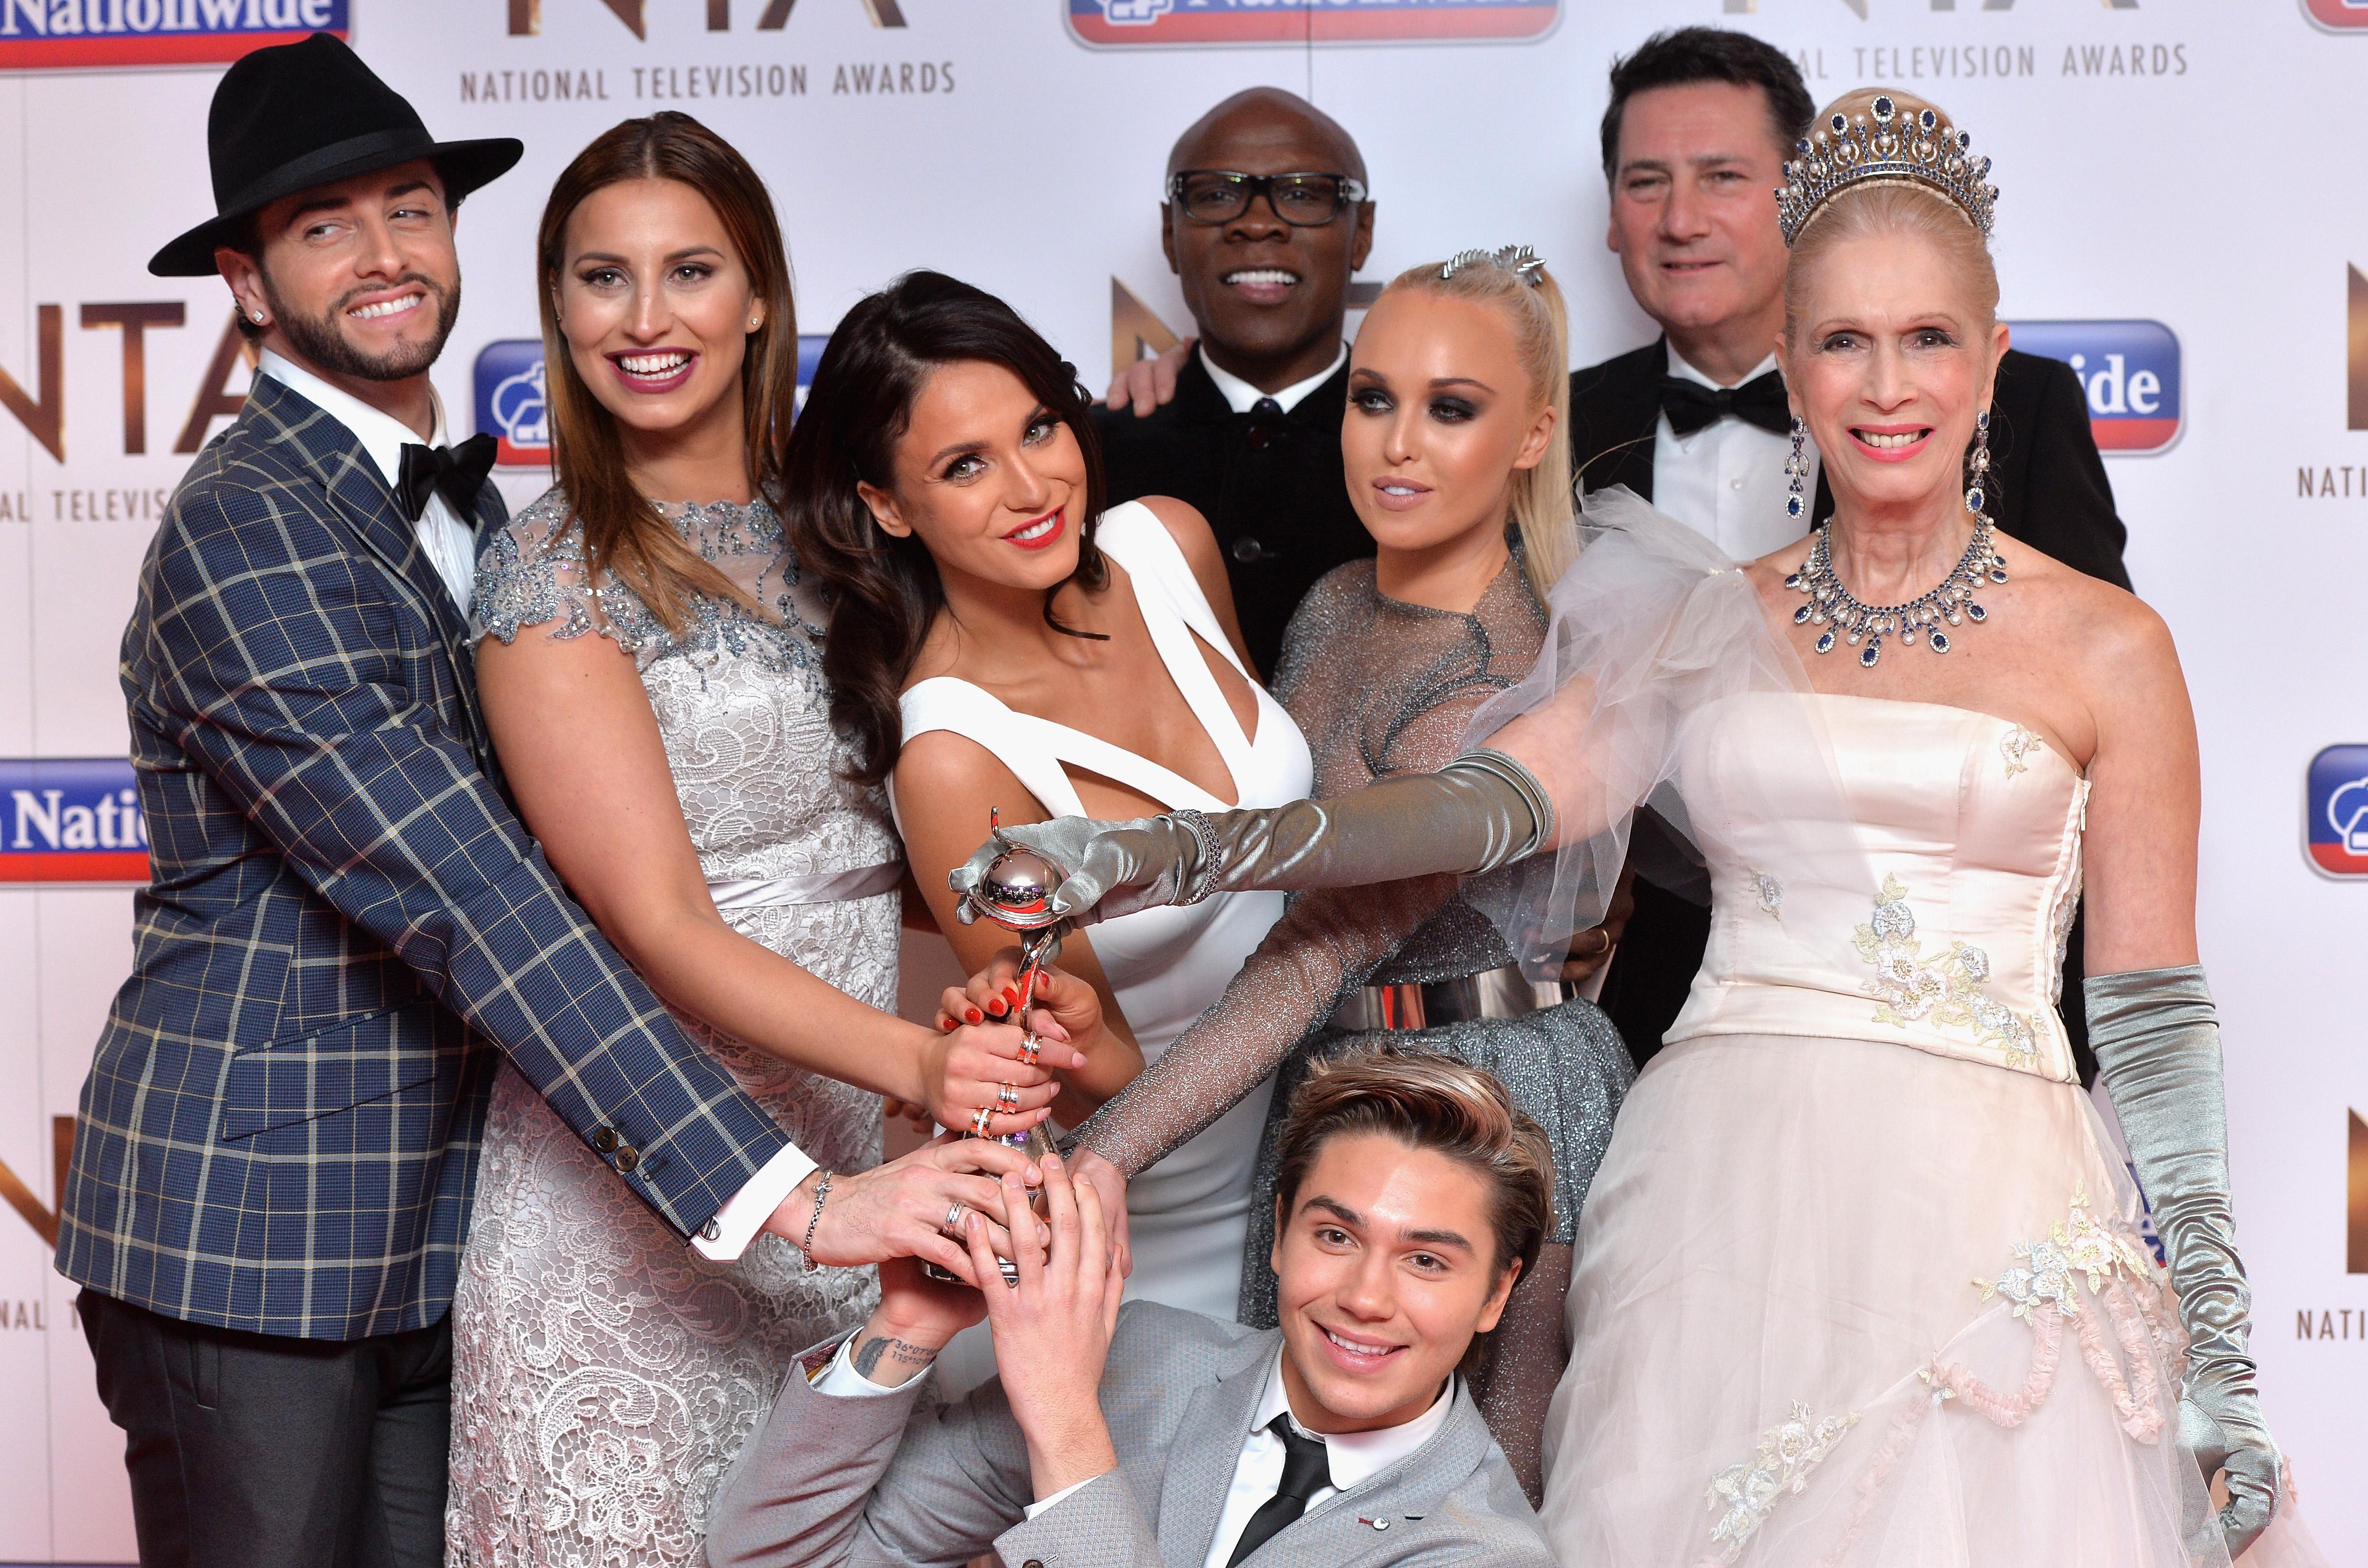 I'm A Celebrity National Television Awards - Winne